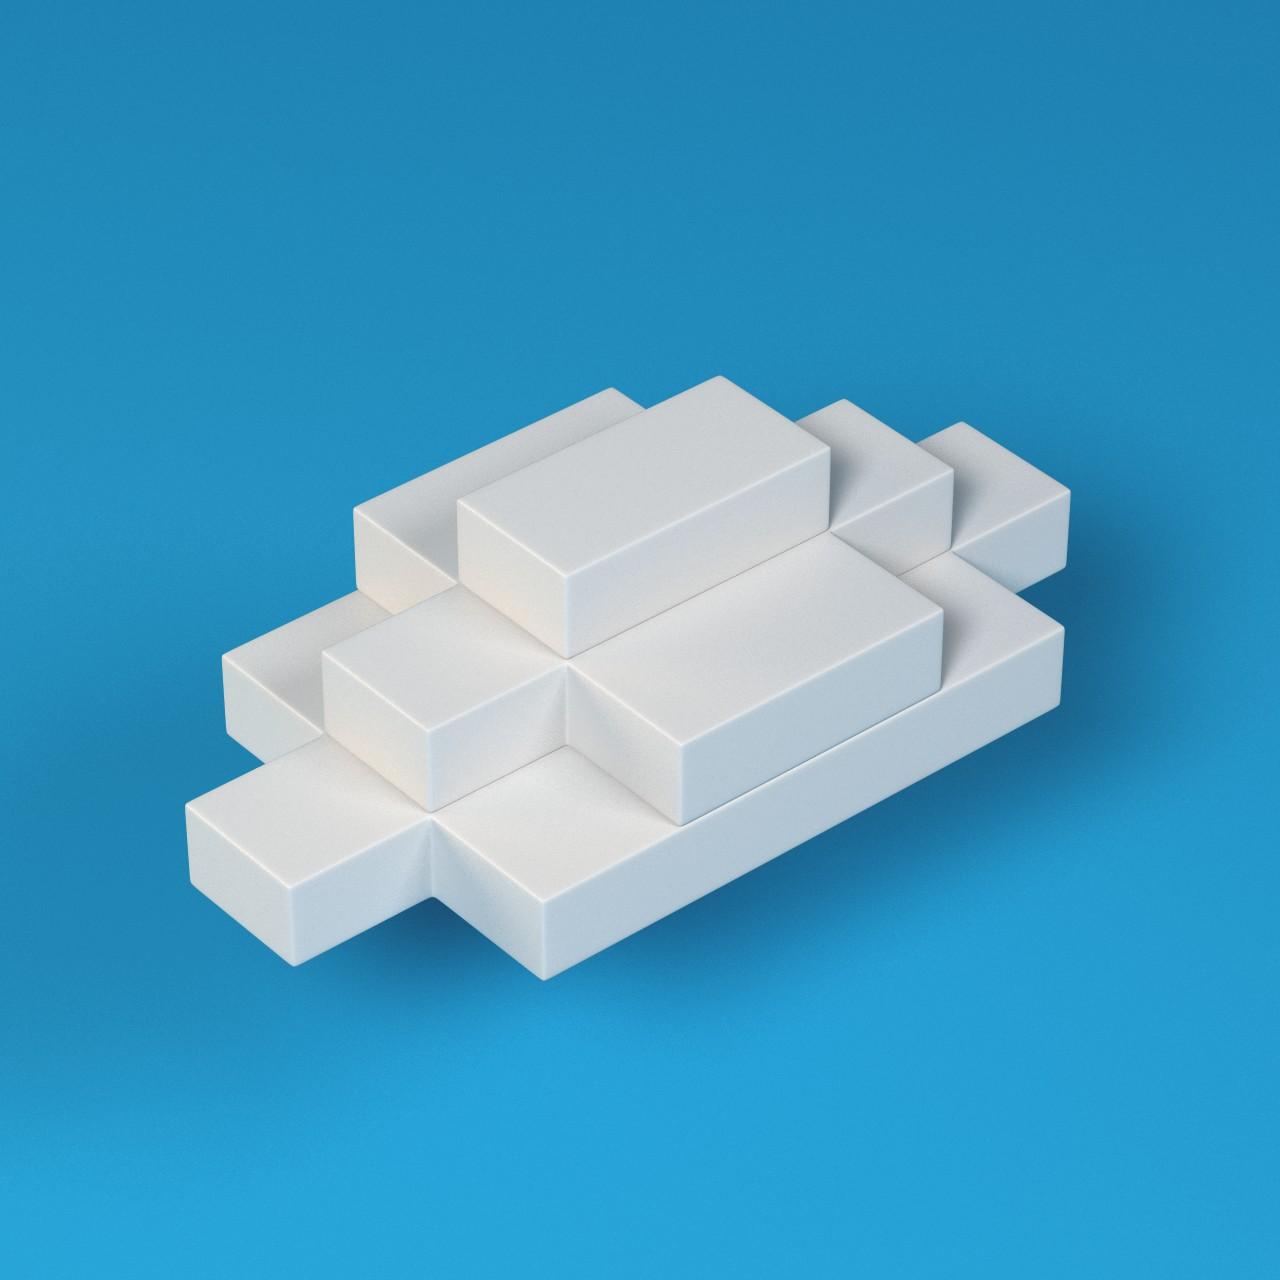 cube_cloud_1_1.jpg